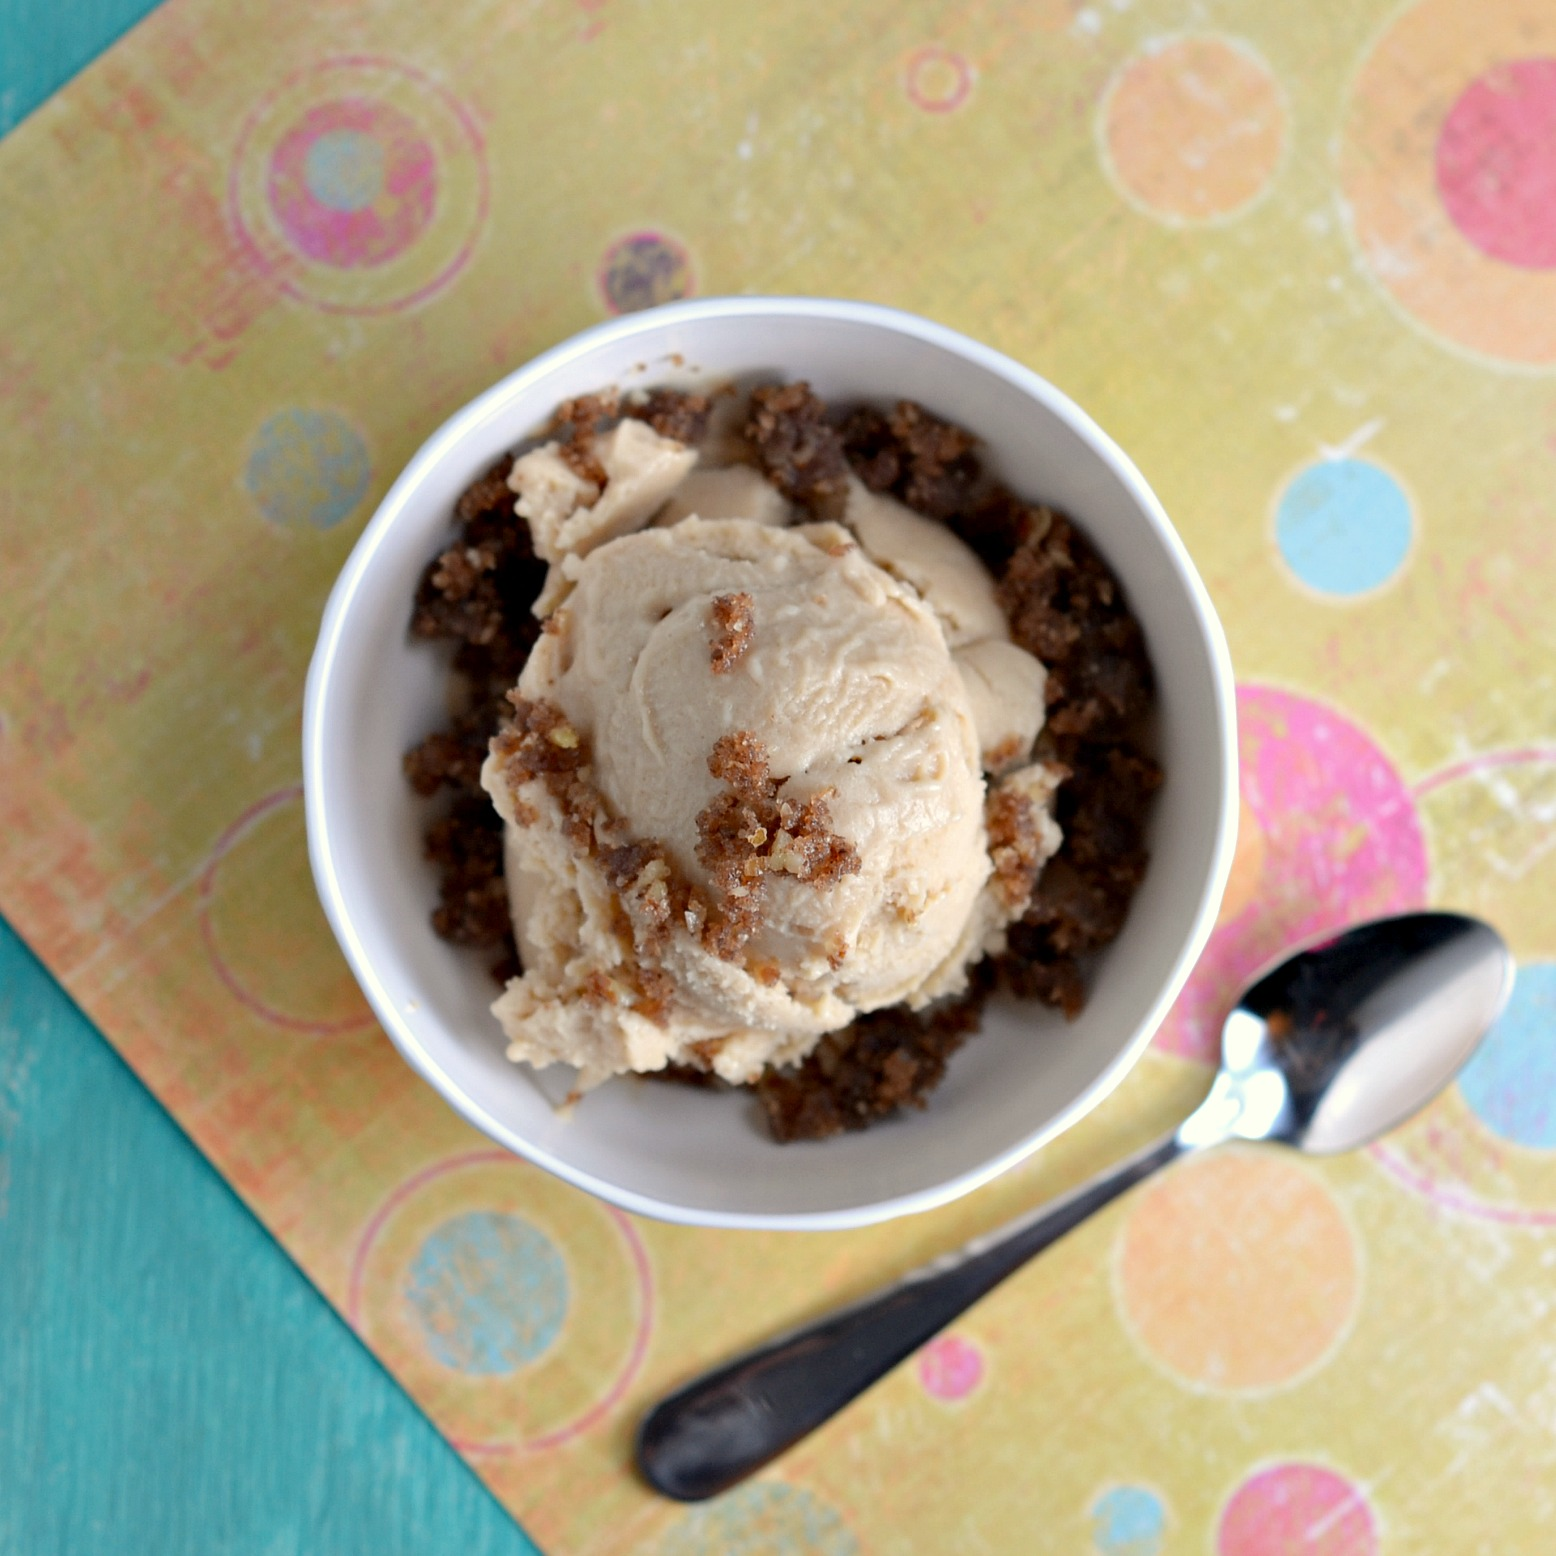 Caras cravings recipe for vegan salted caramel ice cream ccuart Gallery